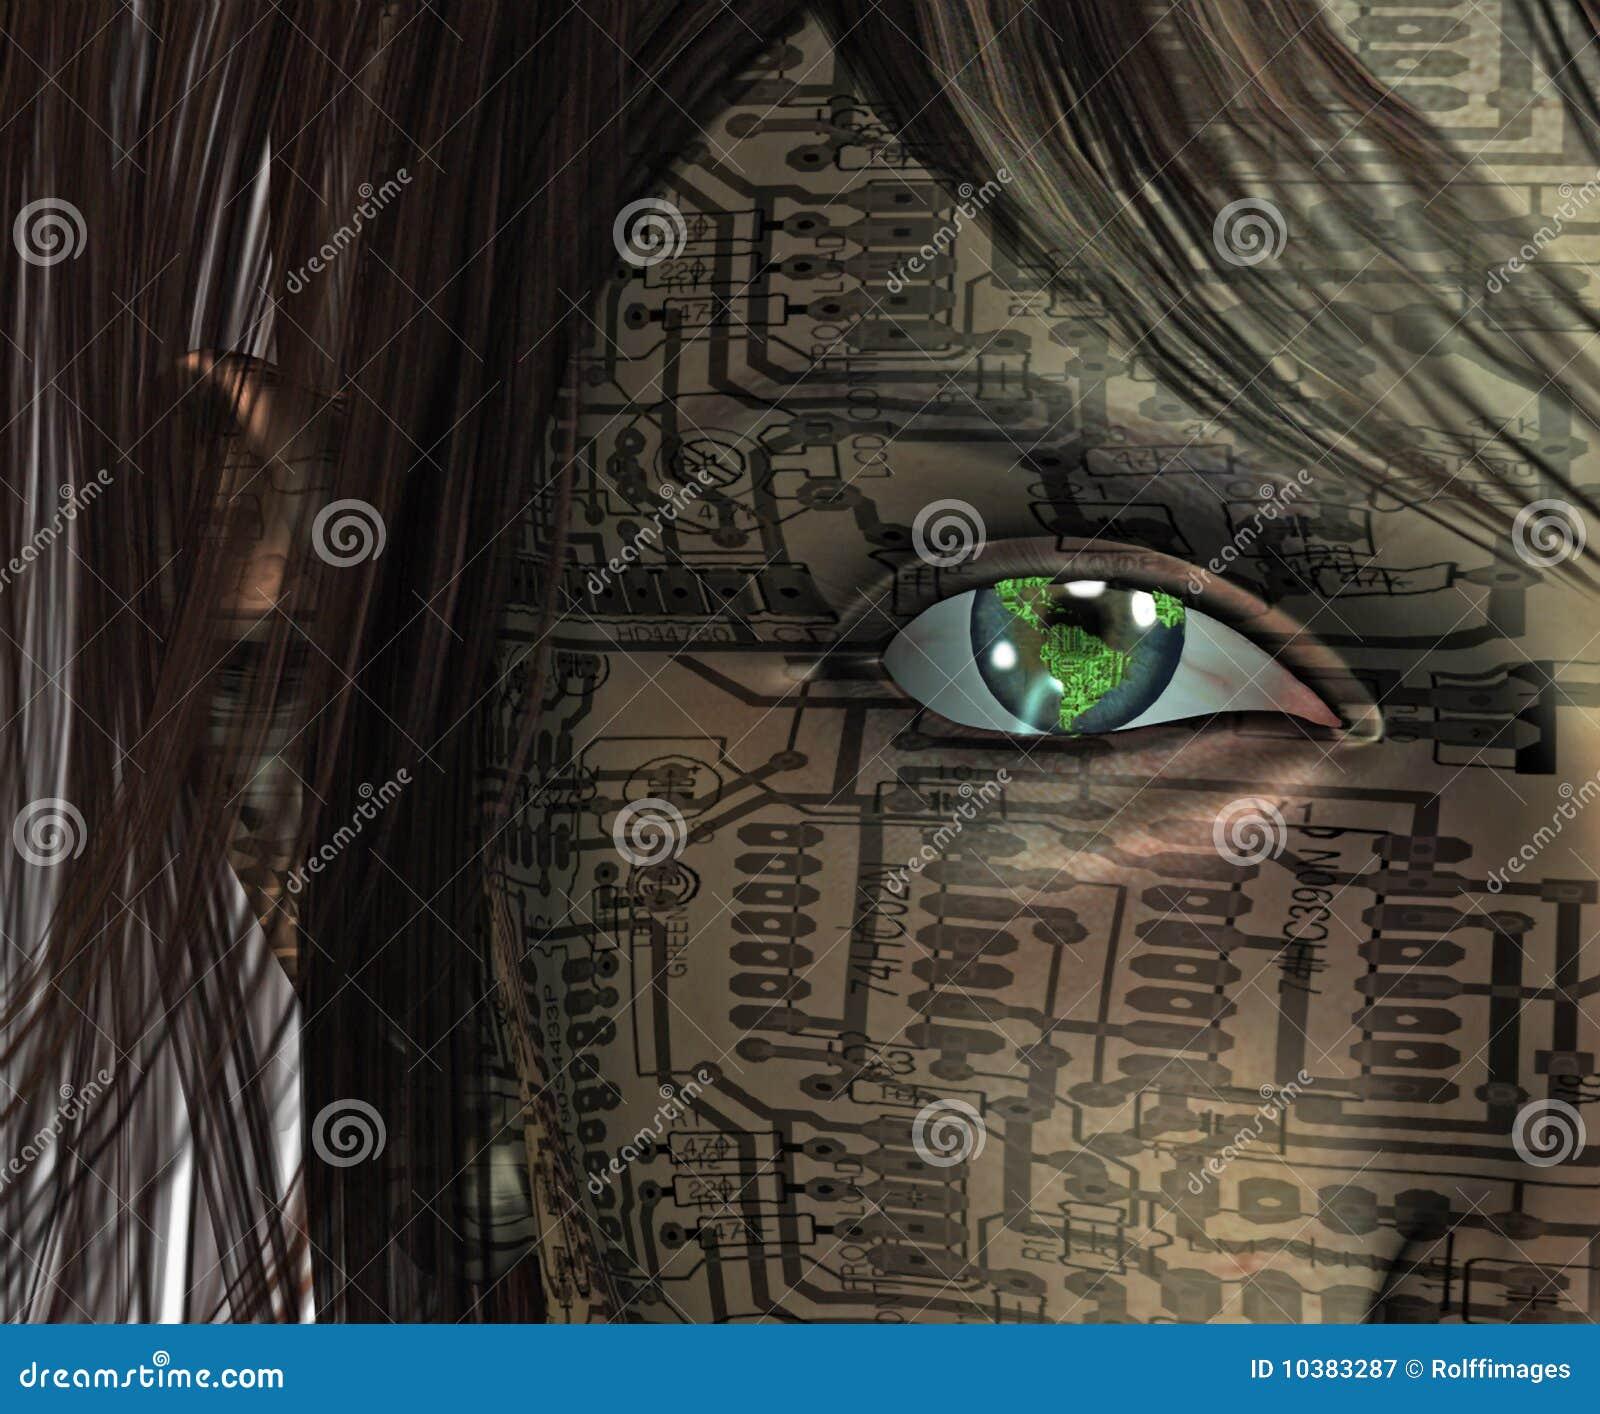 human technology future royalty earth eye dreamstime